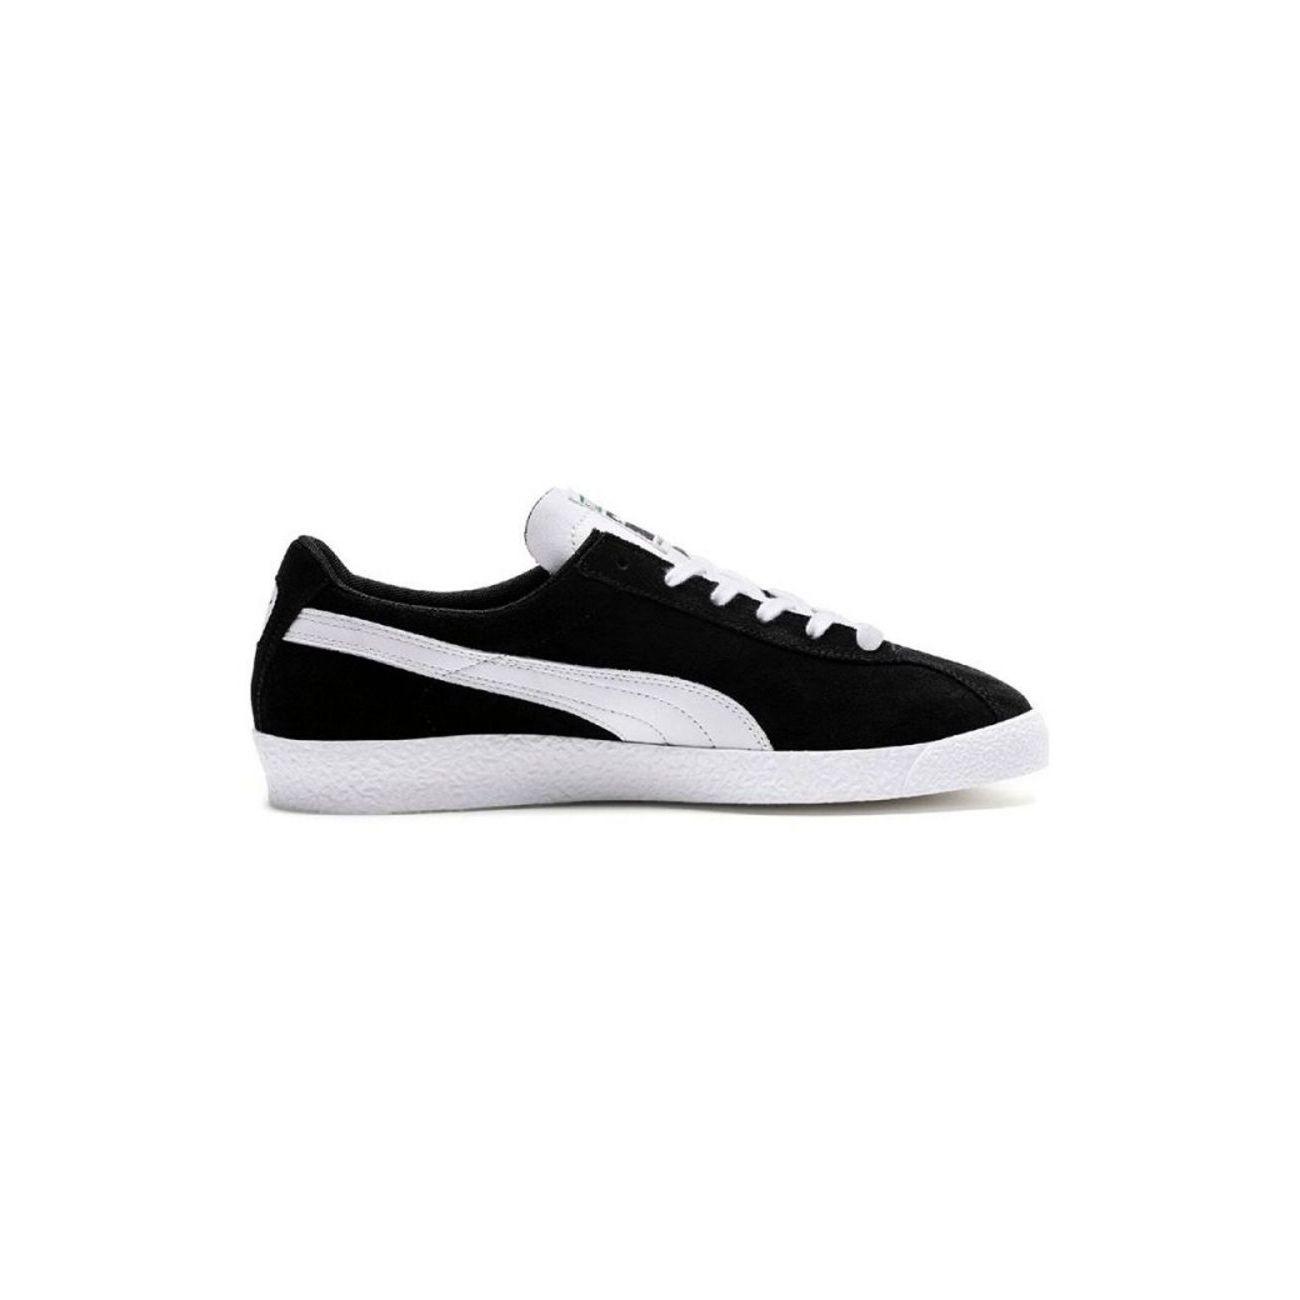 Mode Lifestyle homme PUMA Chaussures Puma Te ku Prime